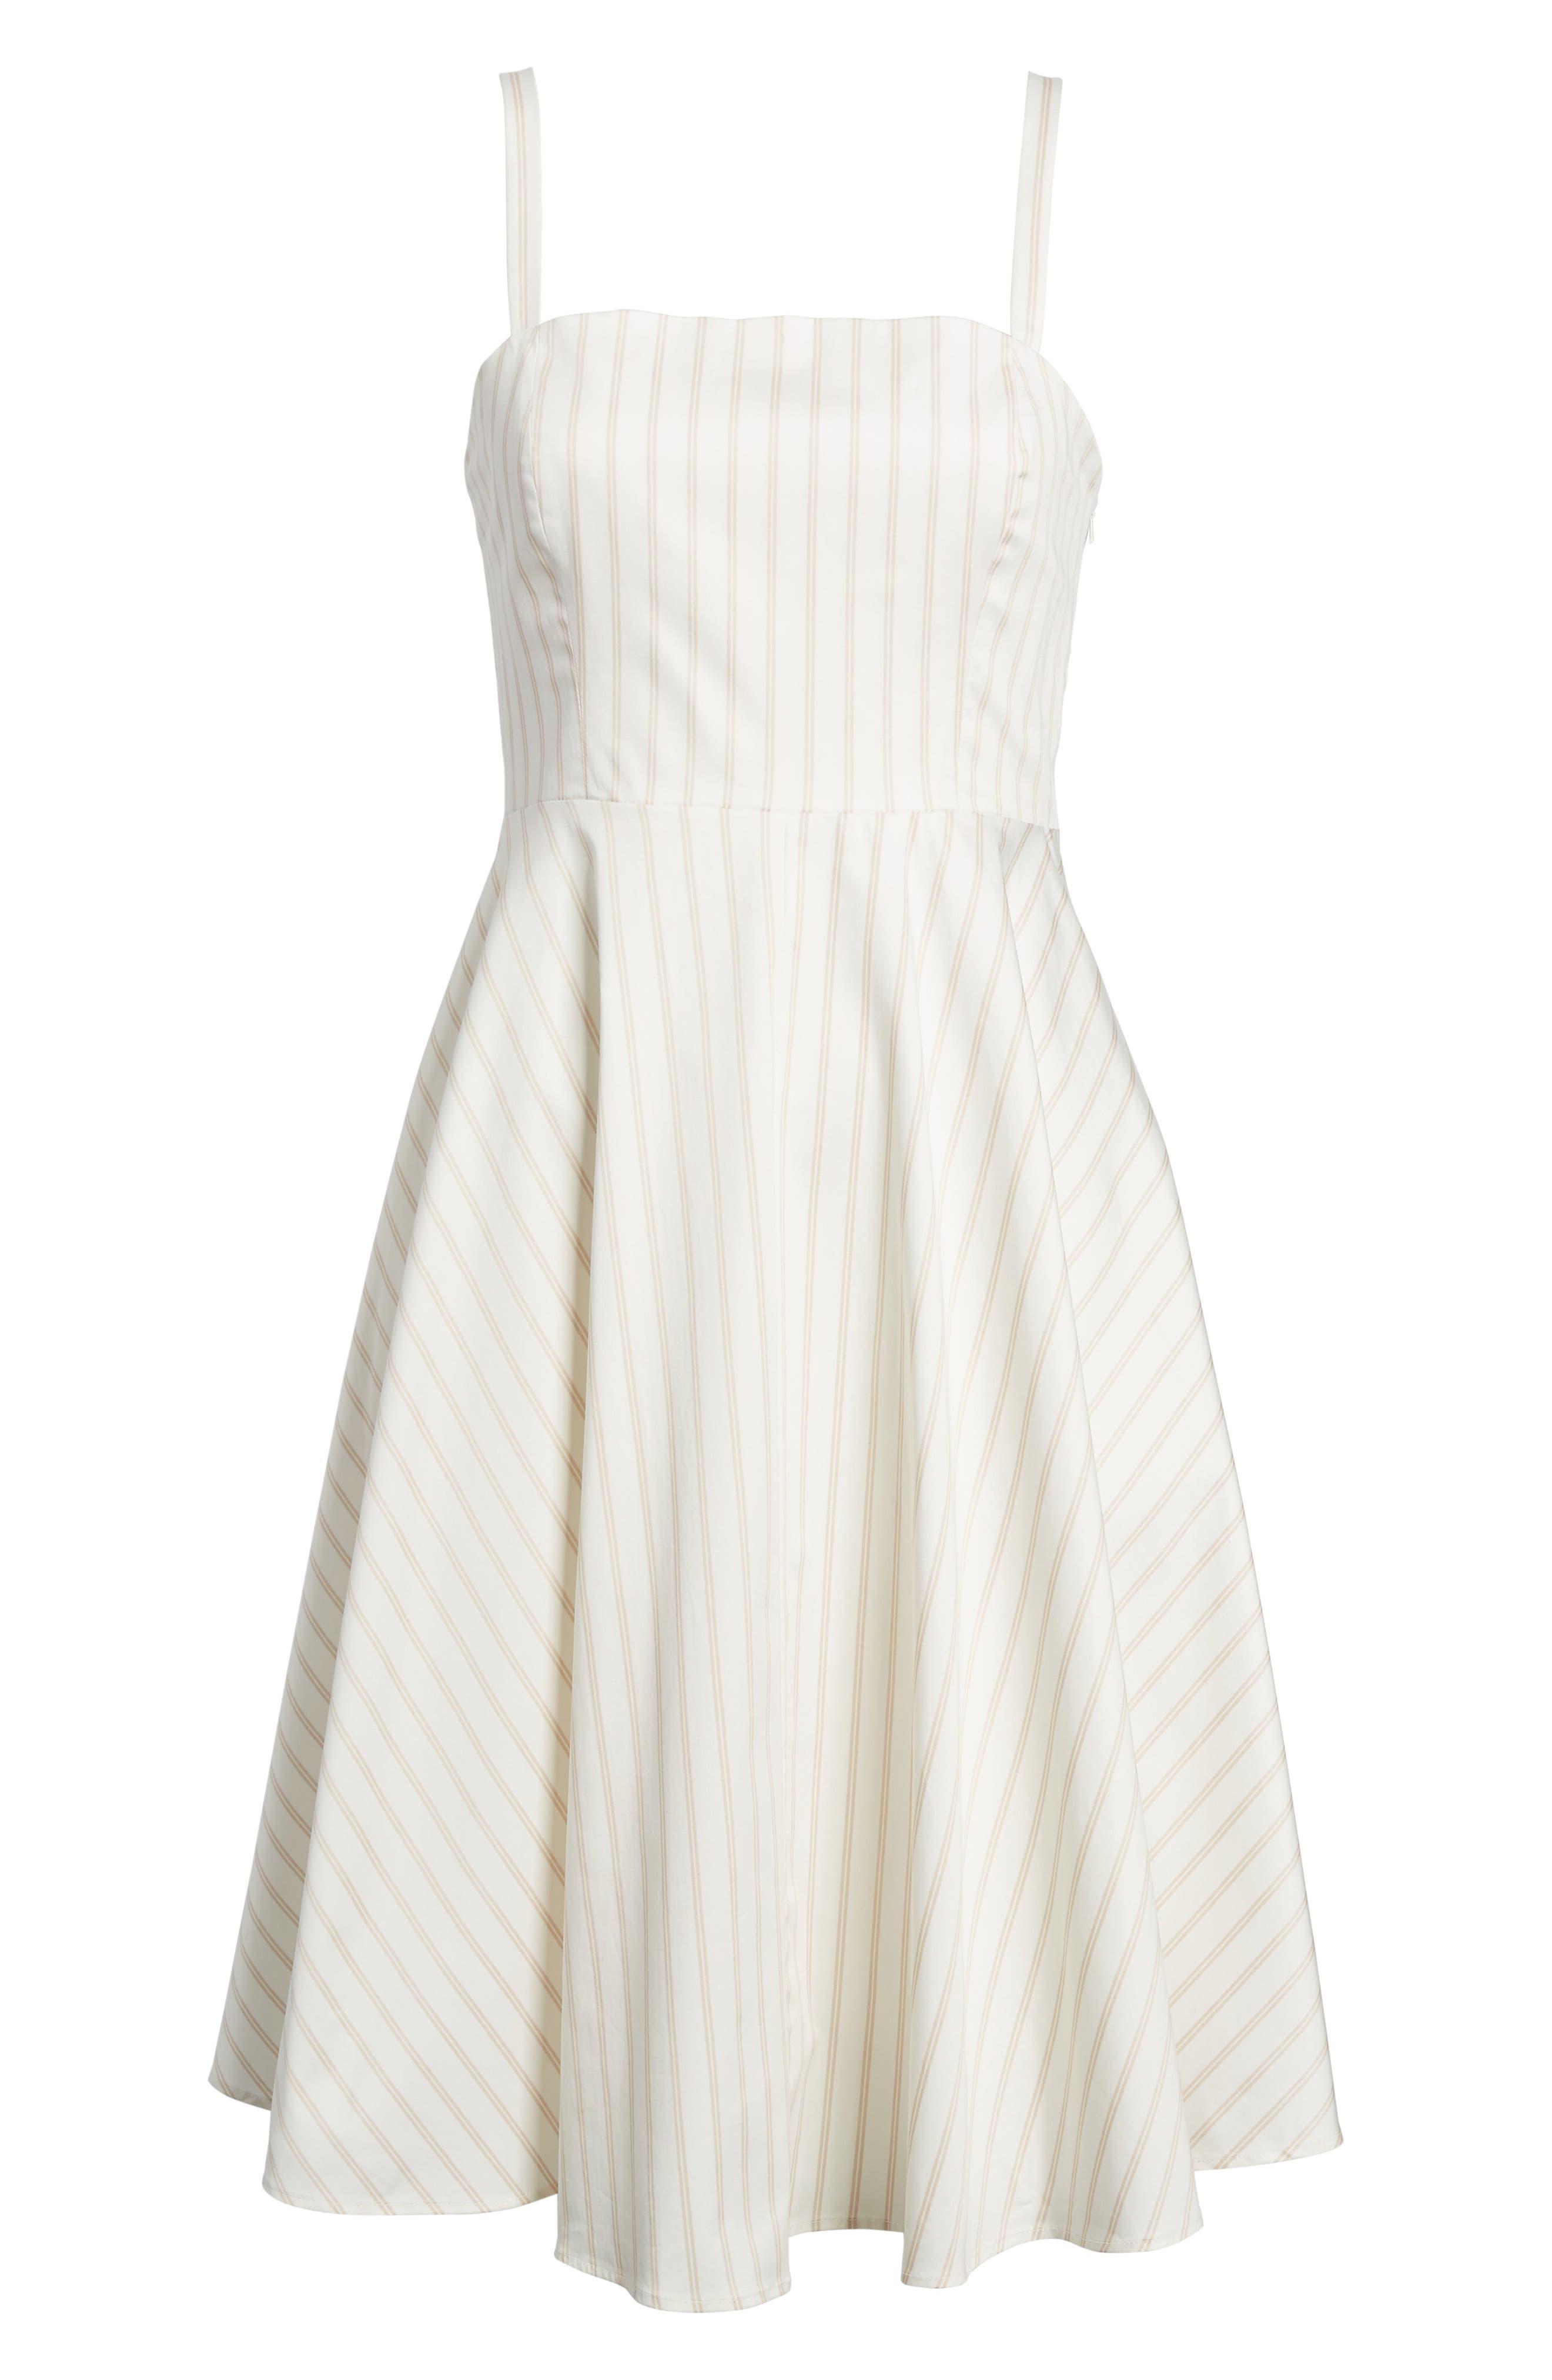 Fit & Flare Dress,                             Alternate thumbnail 6, color,                             Ivory Ashley Stripe